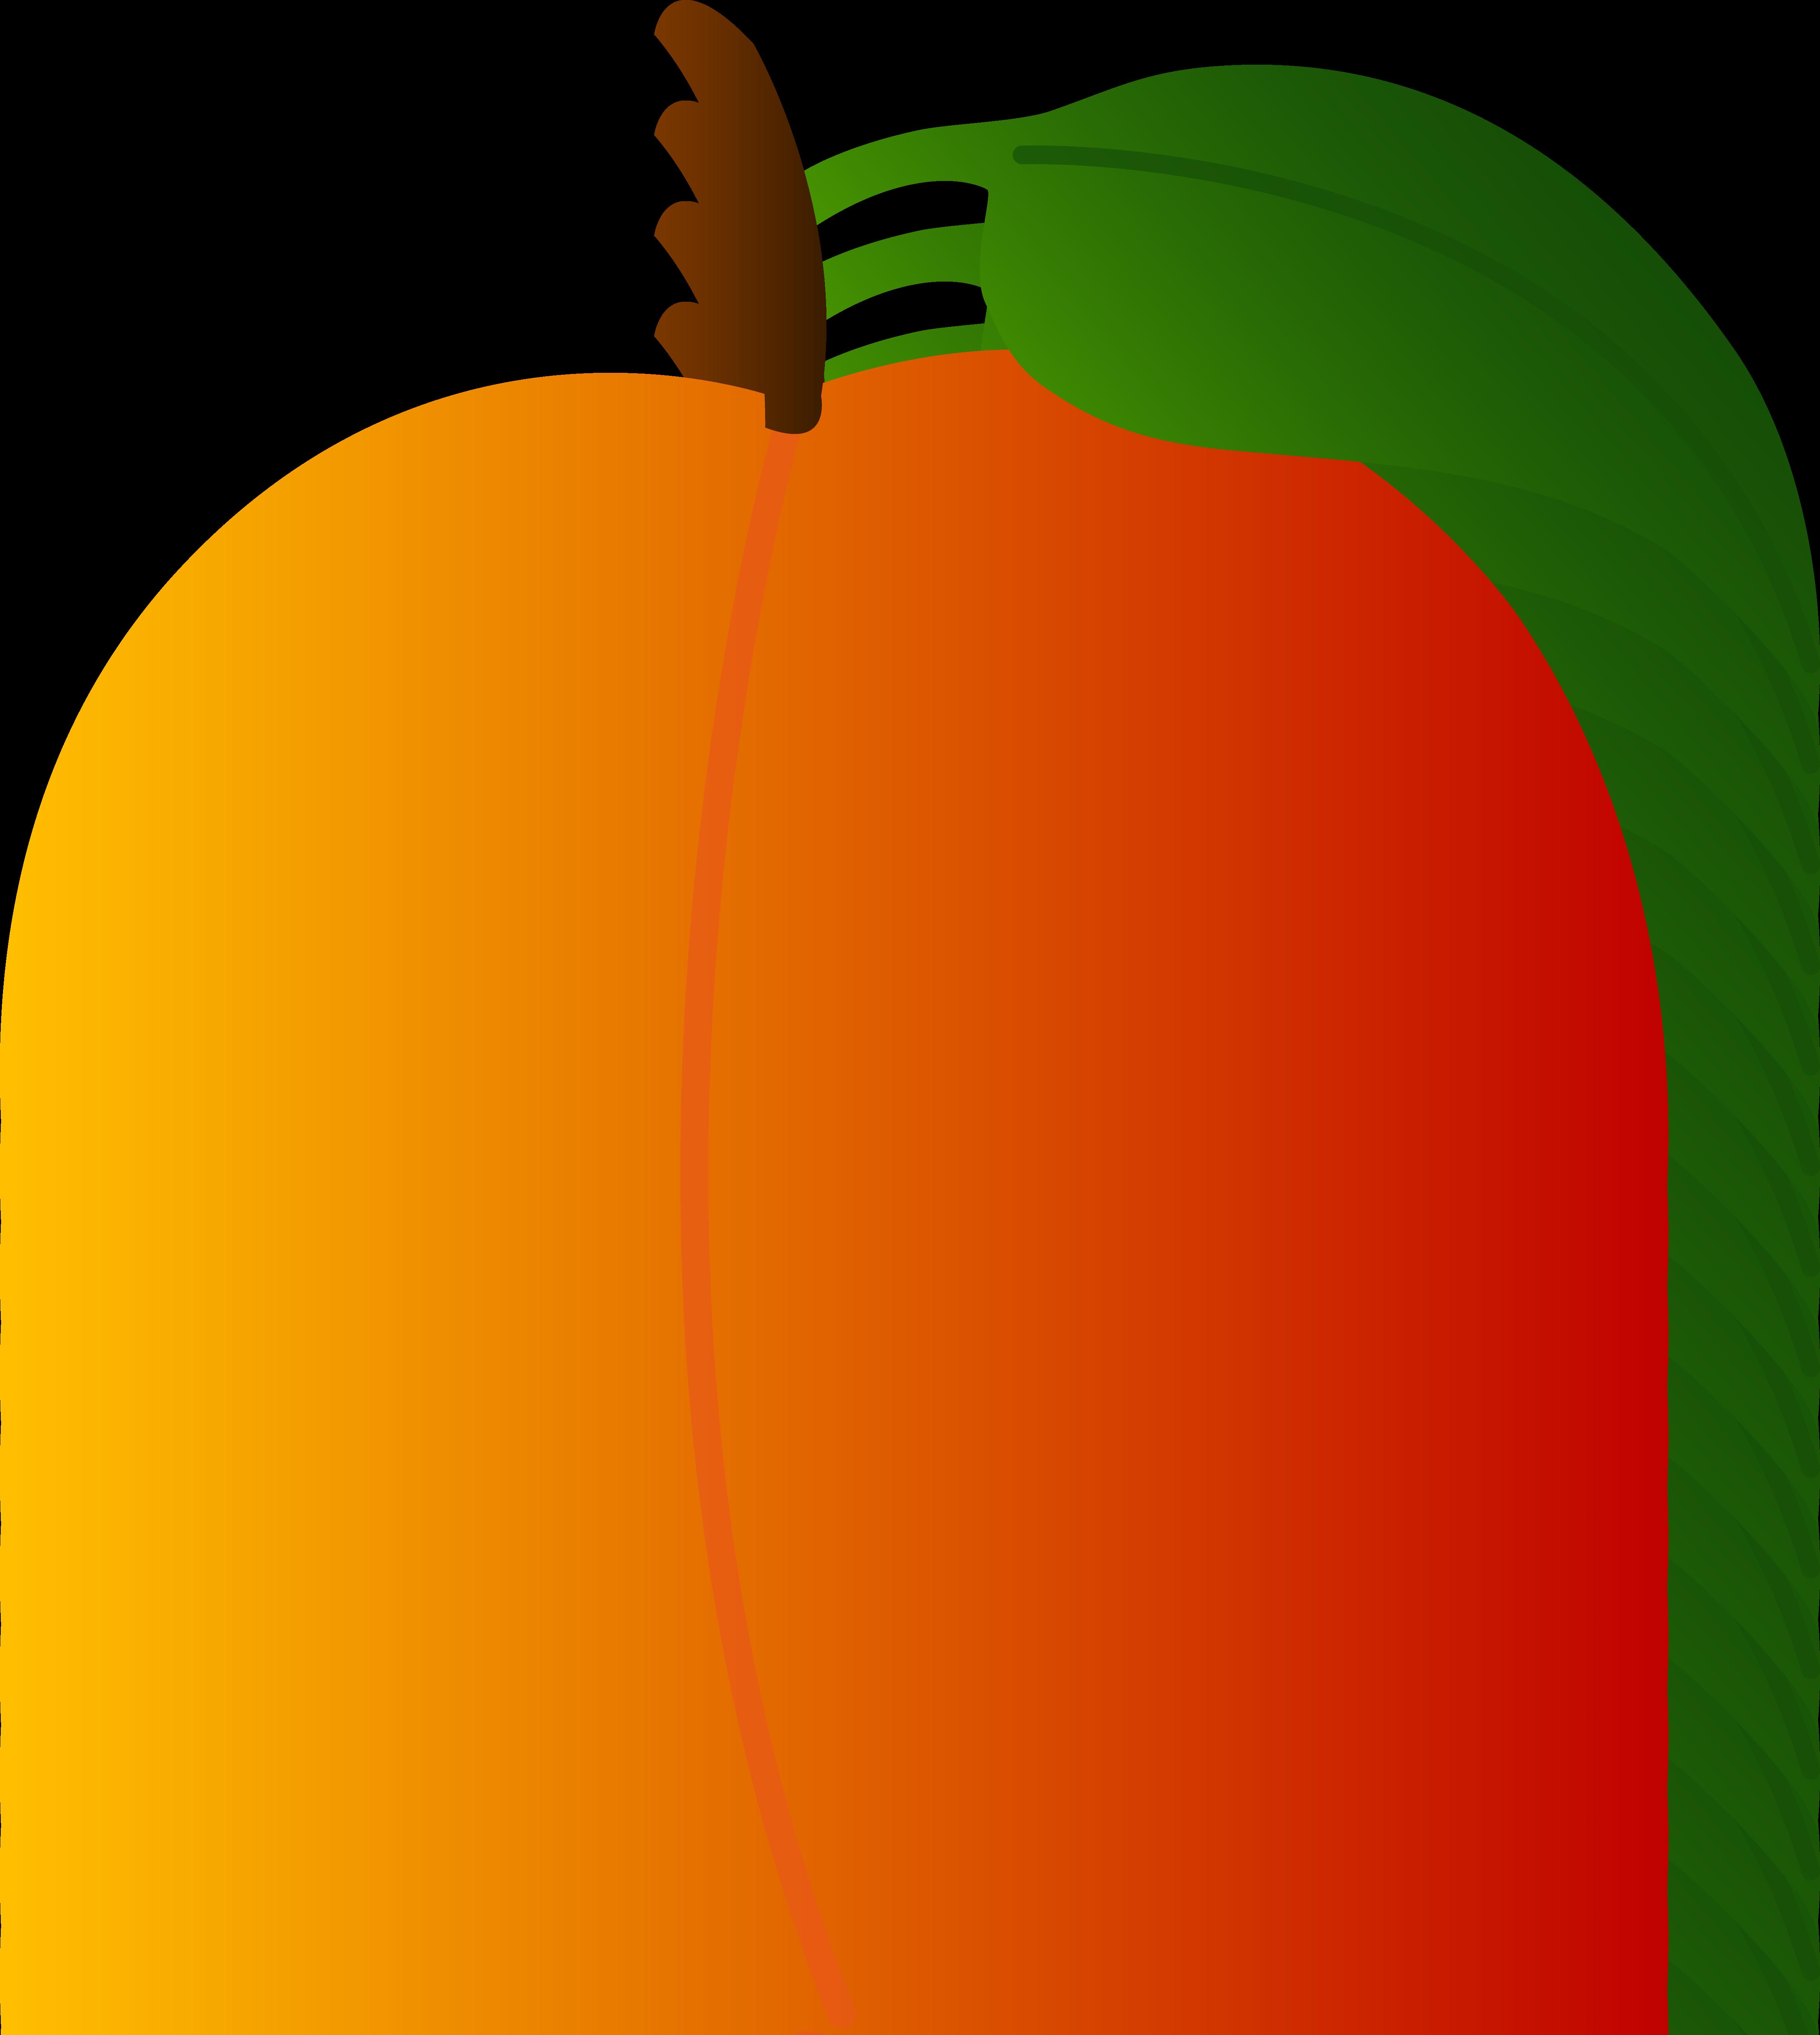 Peach clipart Clipart Clip Free Clipart Peach